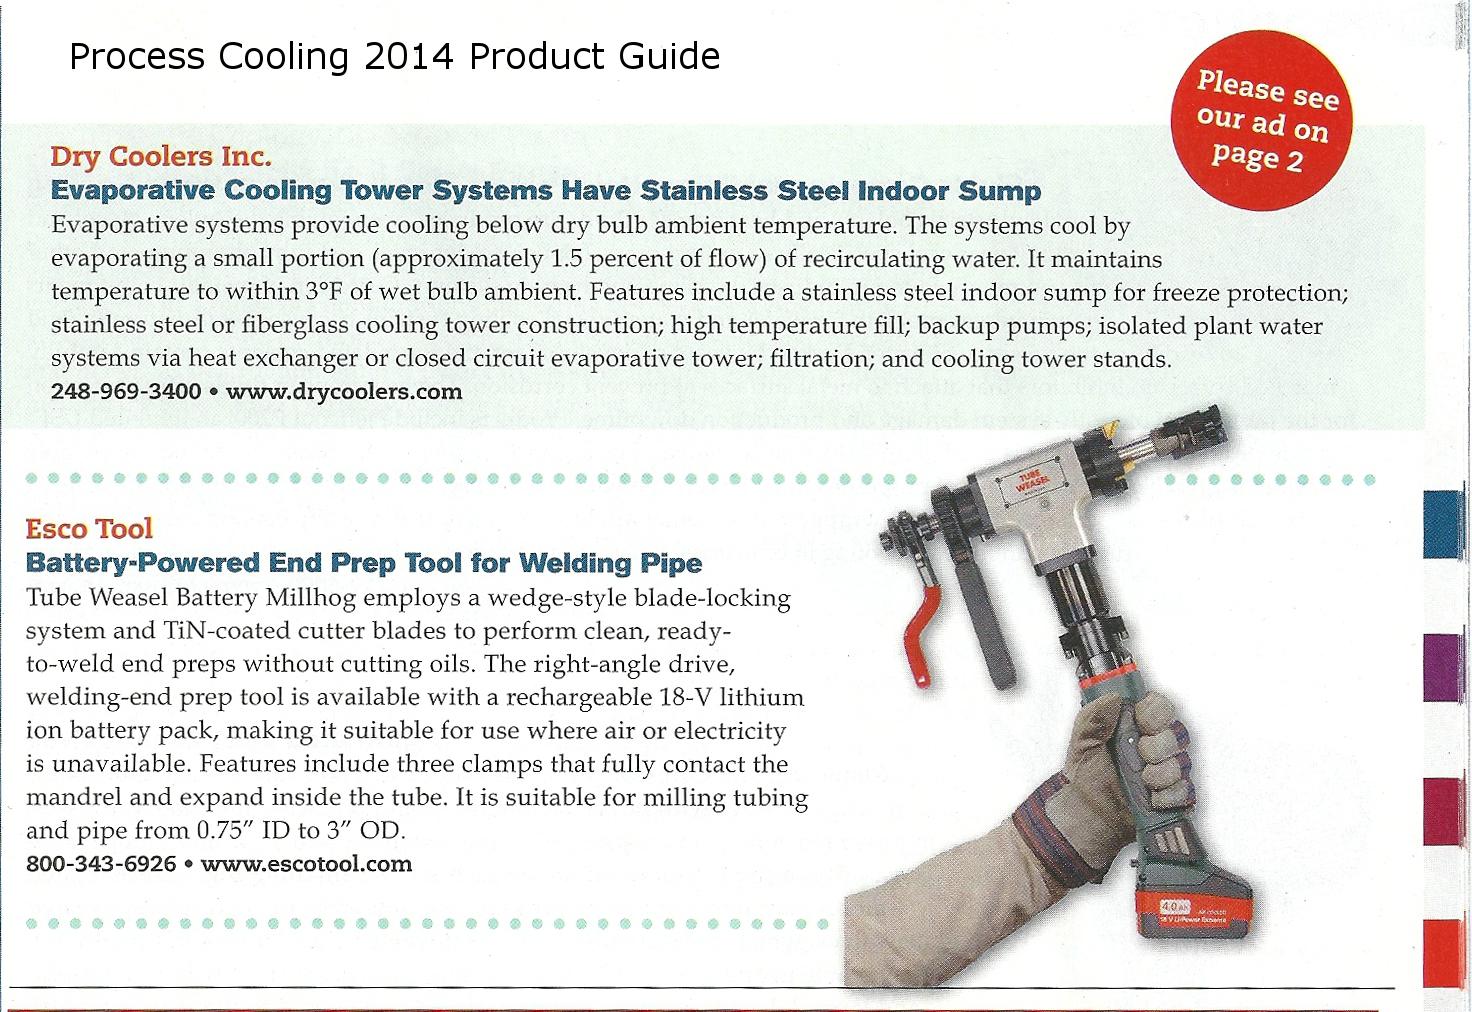 Esco-Process Cooling P.22